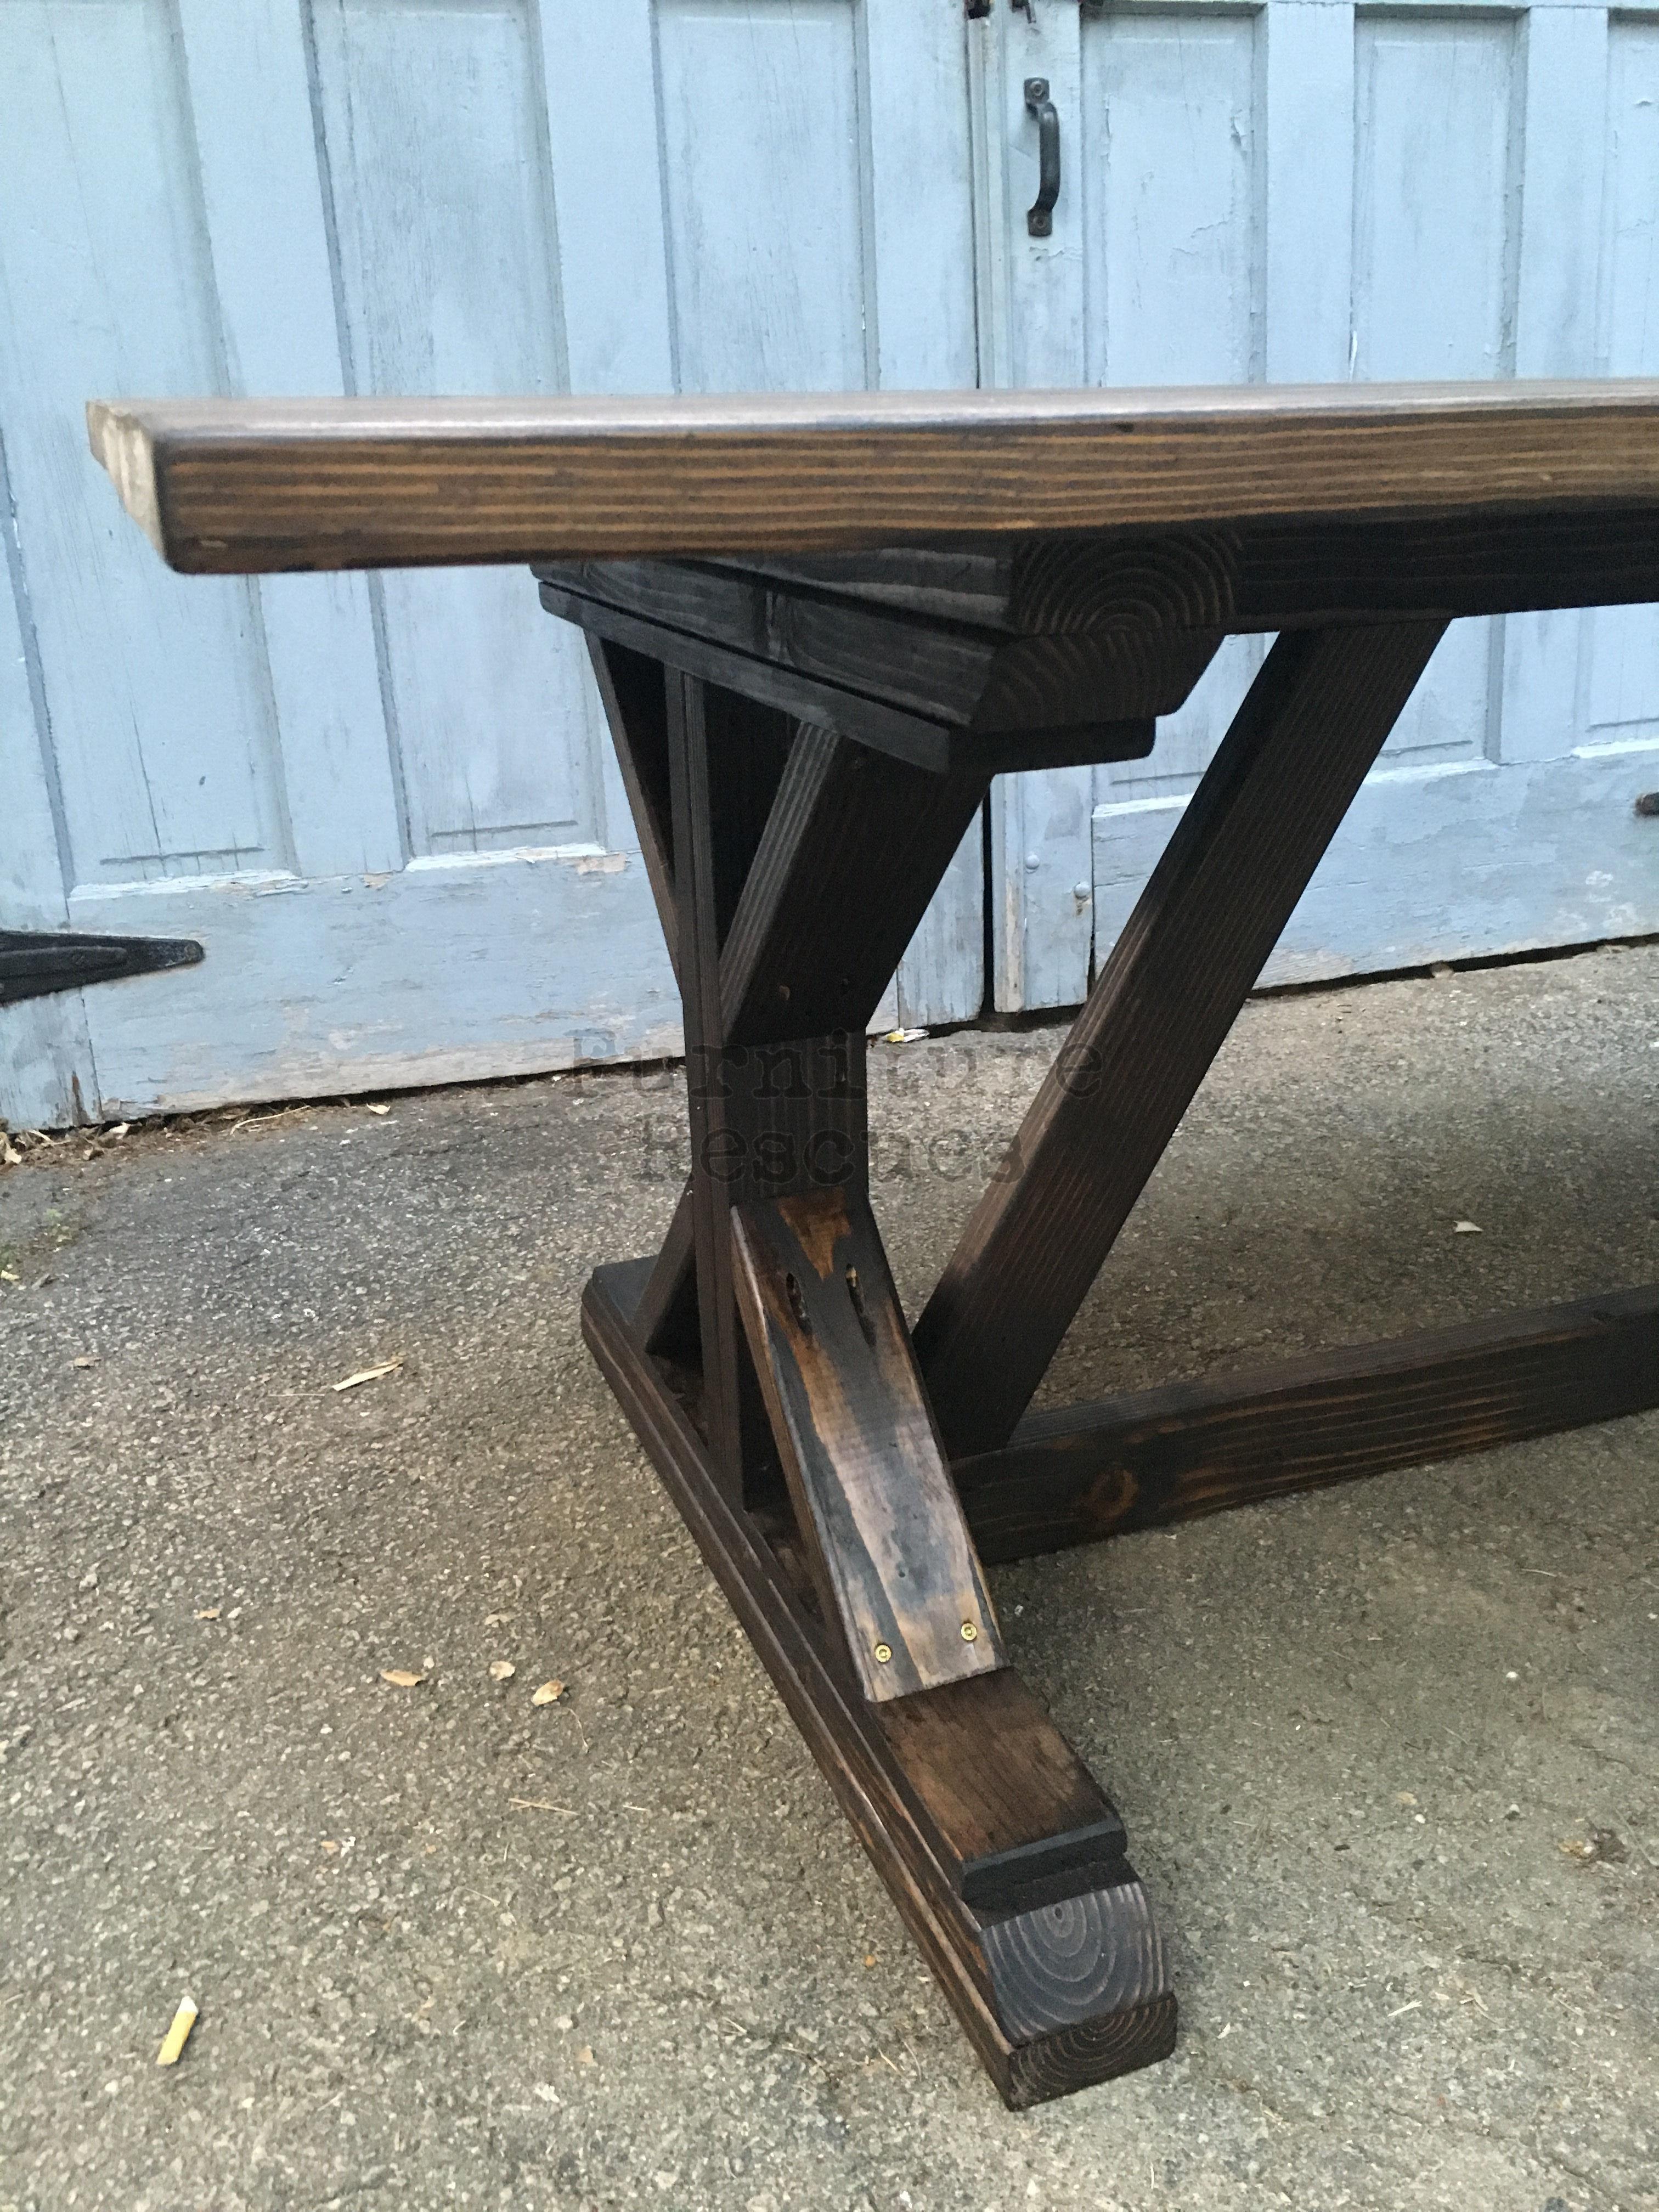 Farm Style Rustic Dining Table Furniture Rescues : Farm Style Rustic Dining Table Legs from www.furniturerescues.com size 3024 x 4032 jpeg 3872kB